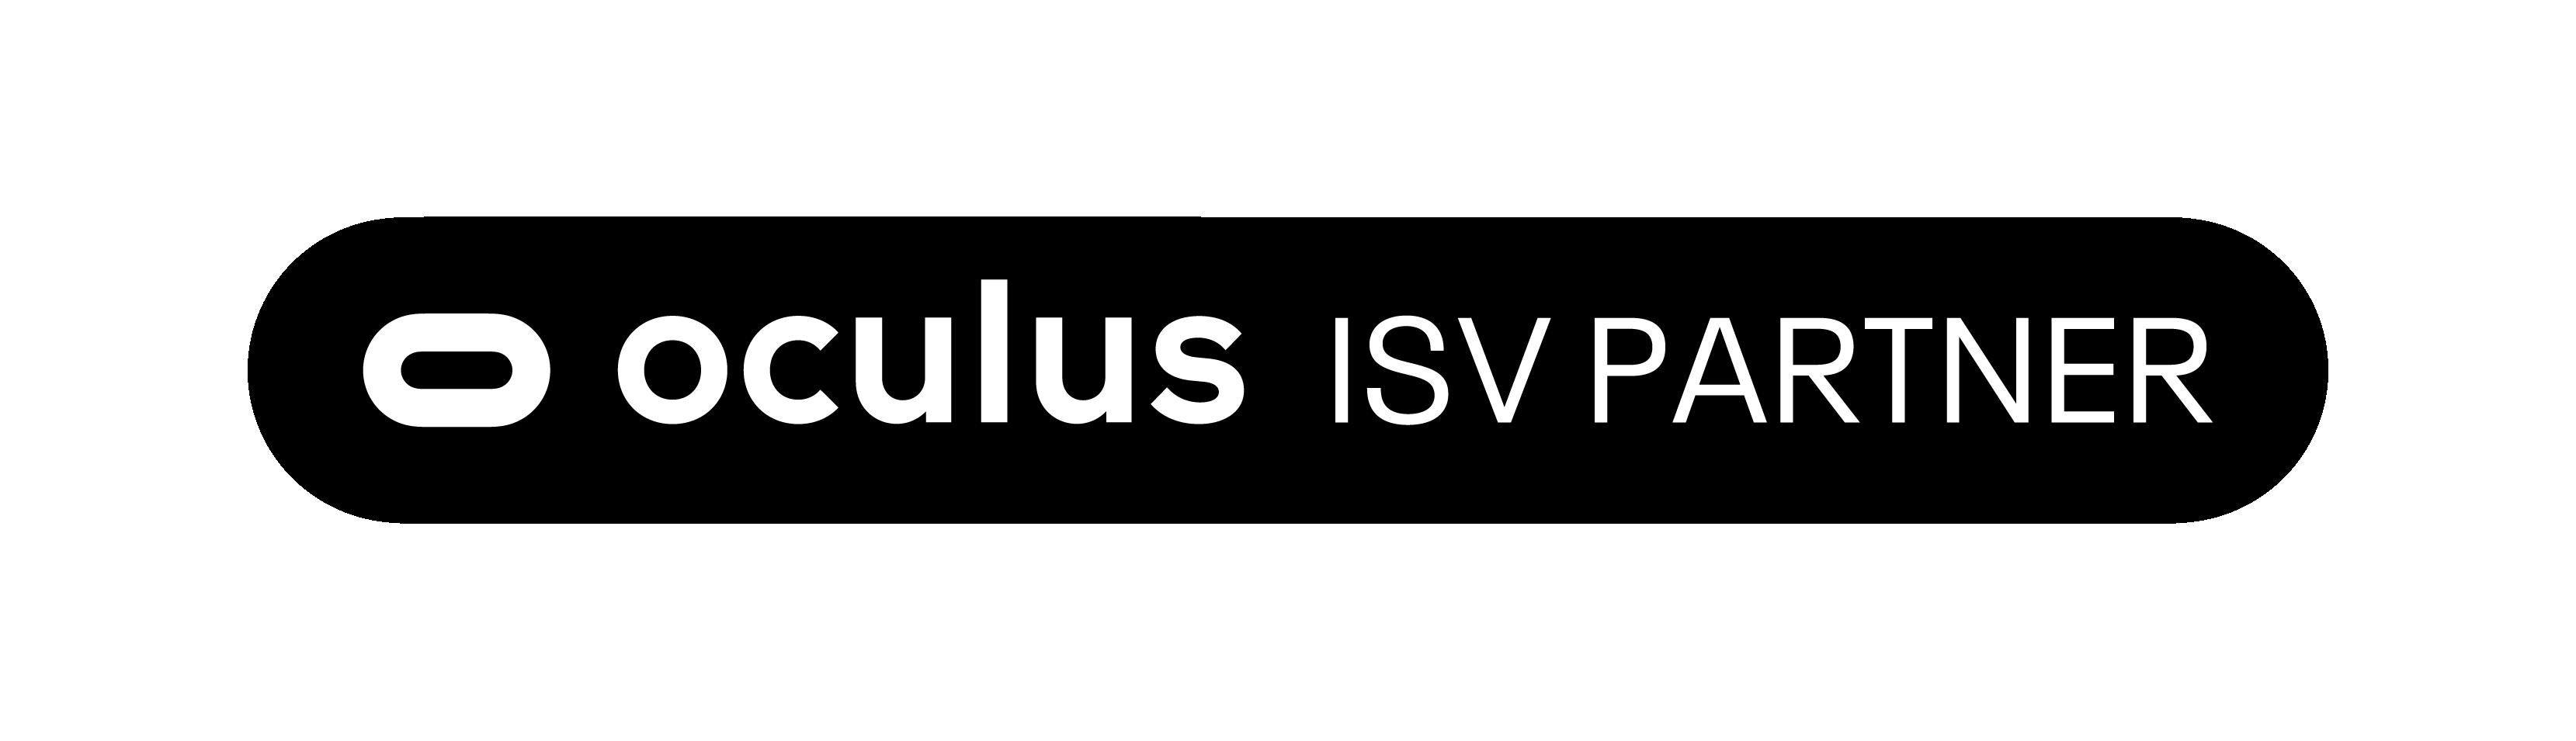 Oculus_ISV_Partner_Pill_Black_RGB